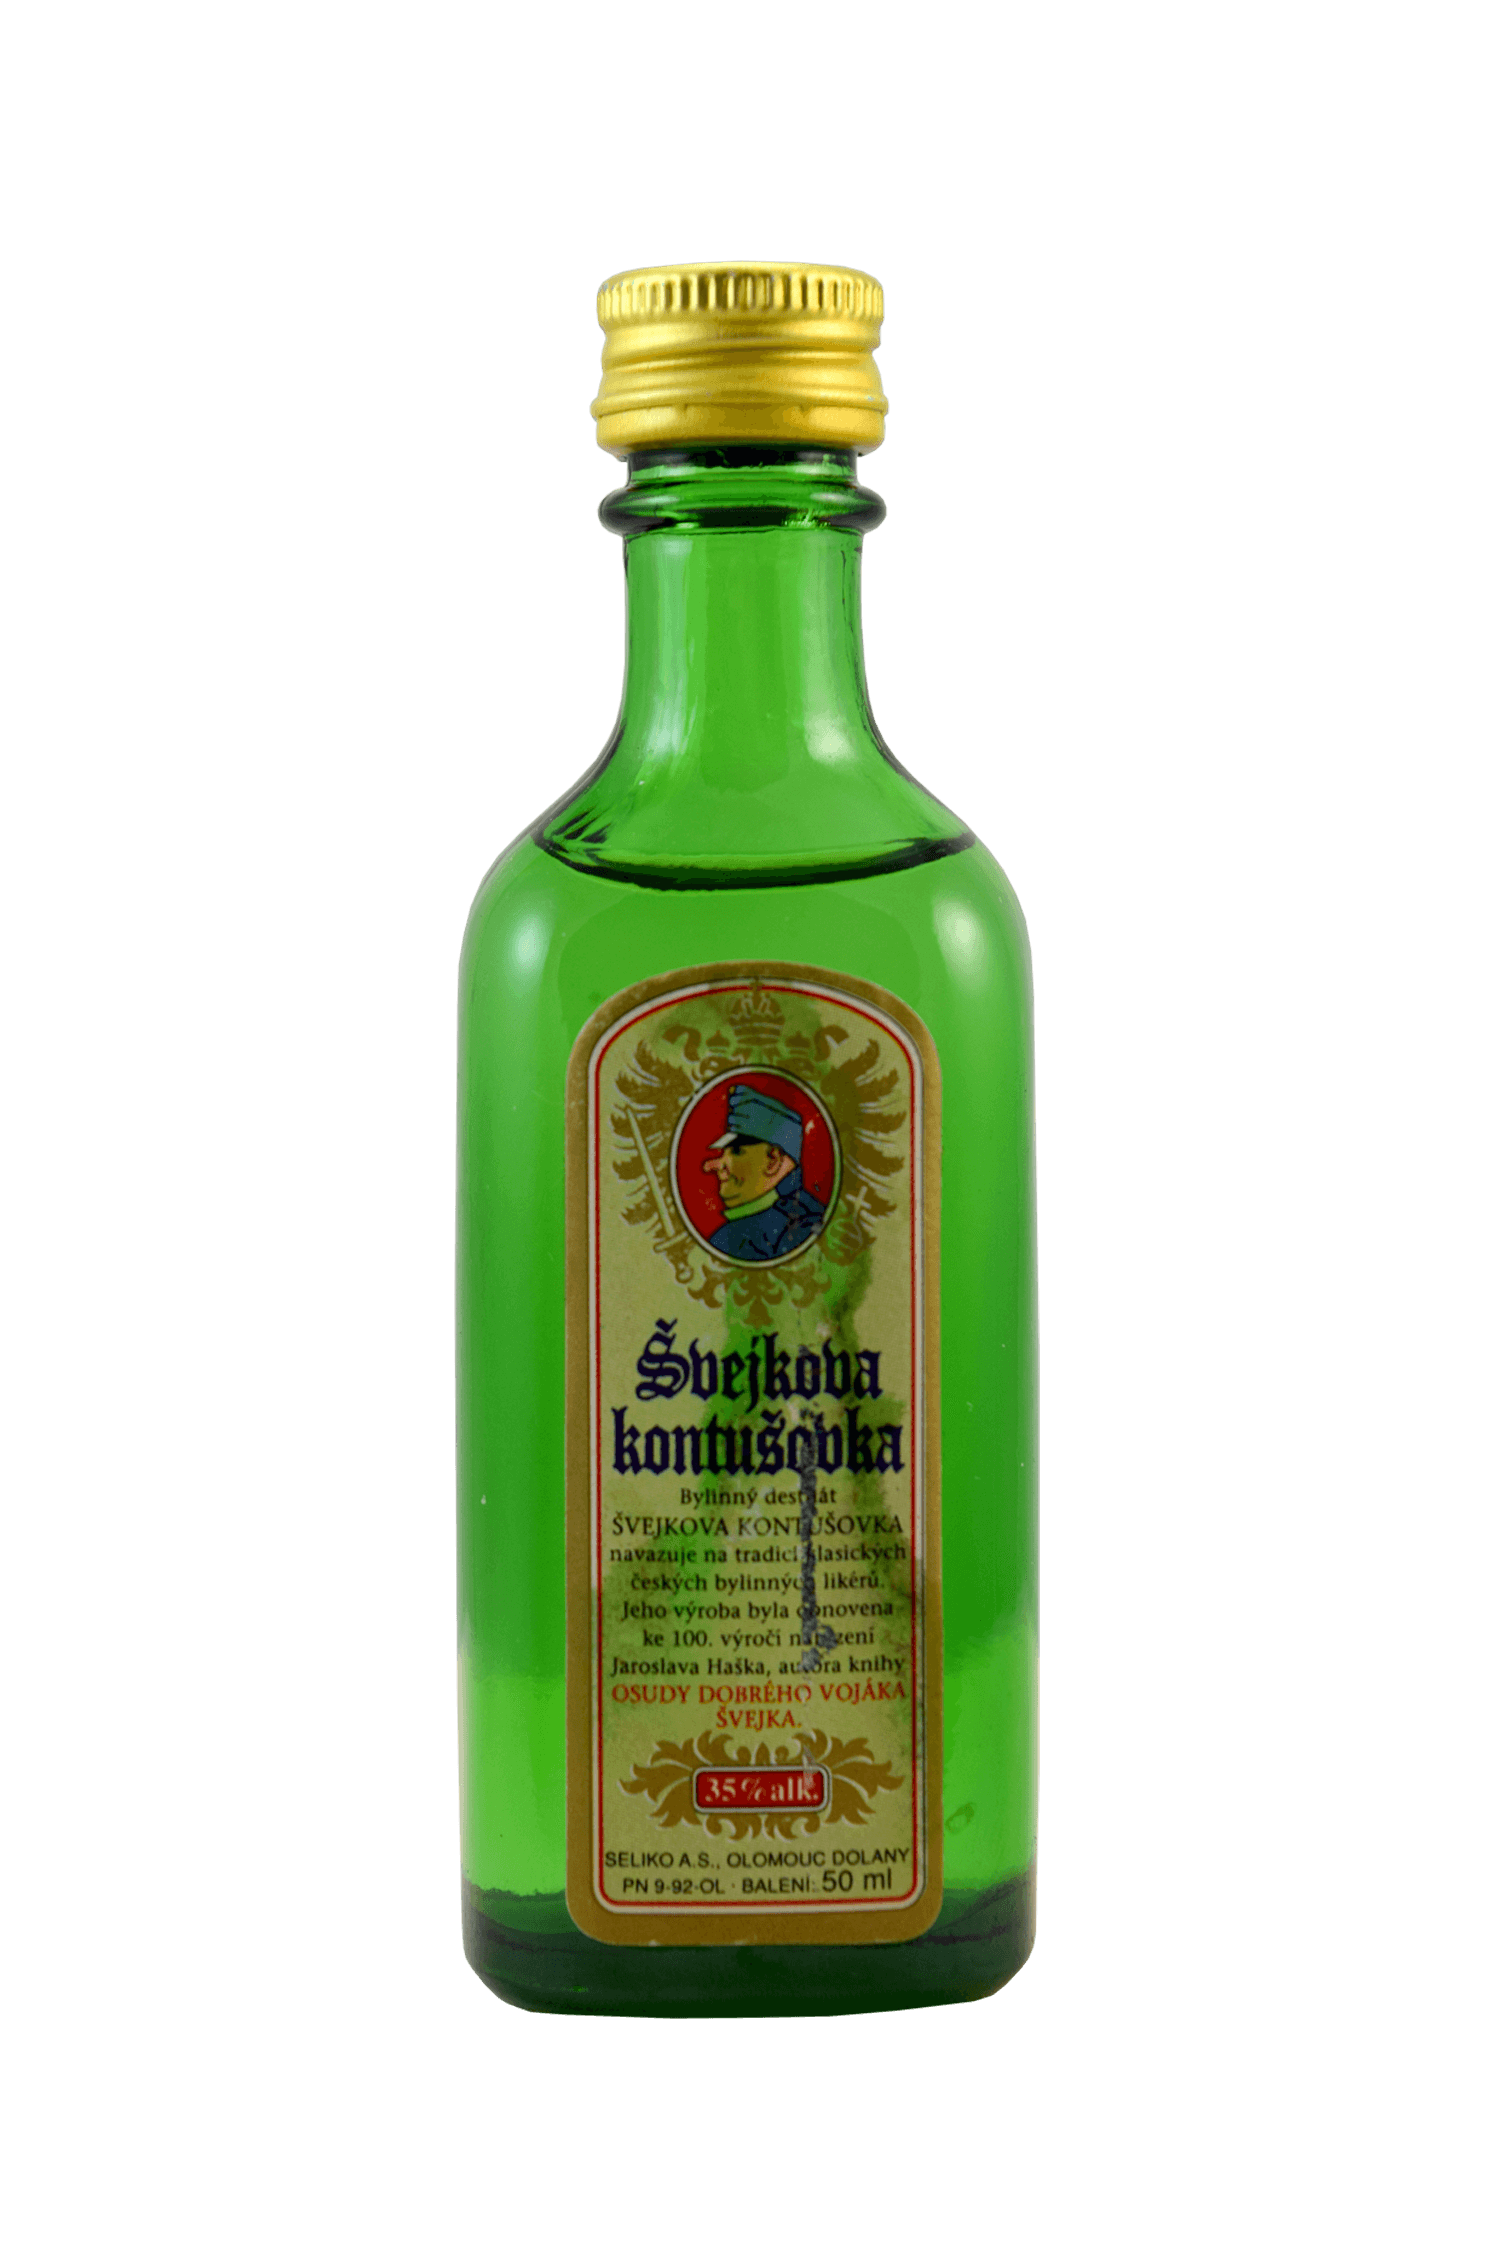 Švejkova Kontušovka